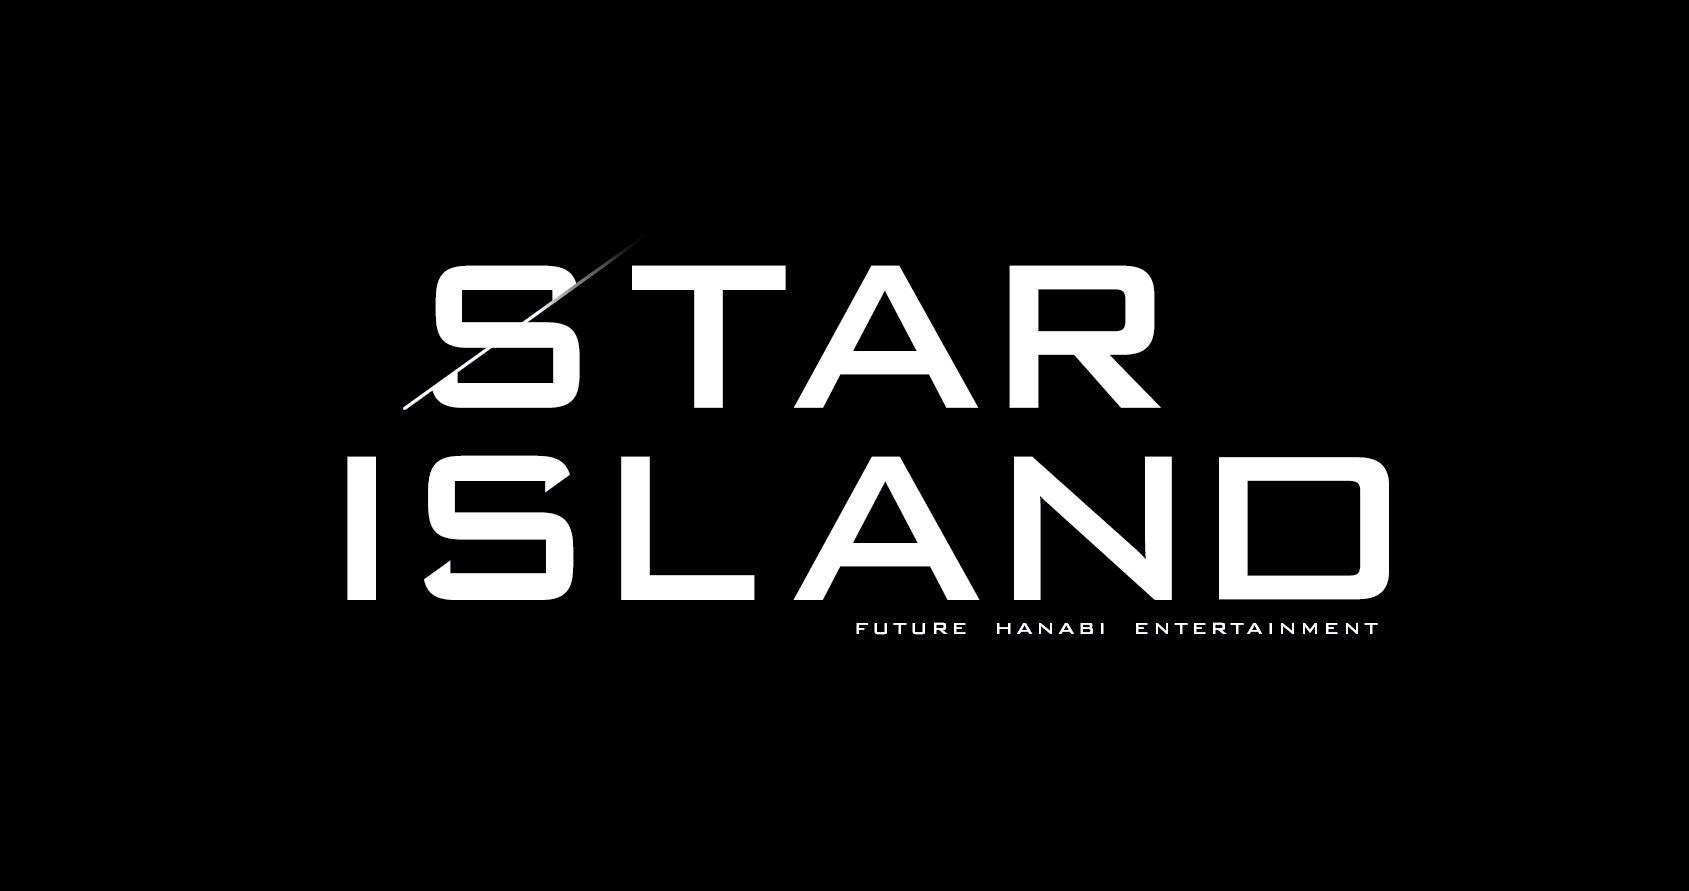 """STAR ISLAND"" Future Hanabi Entertainment"